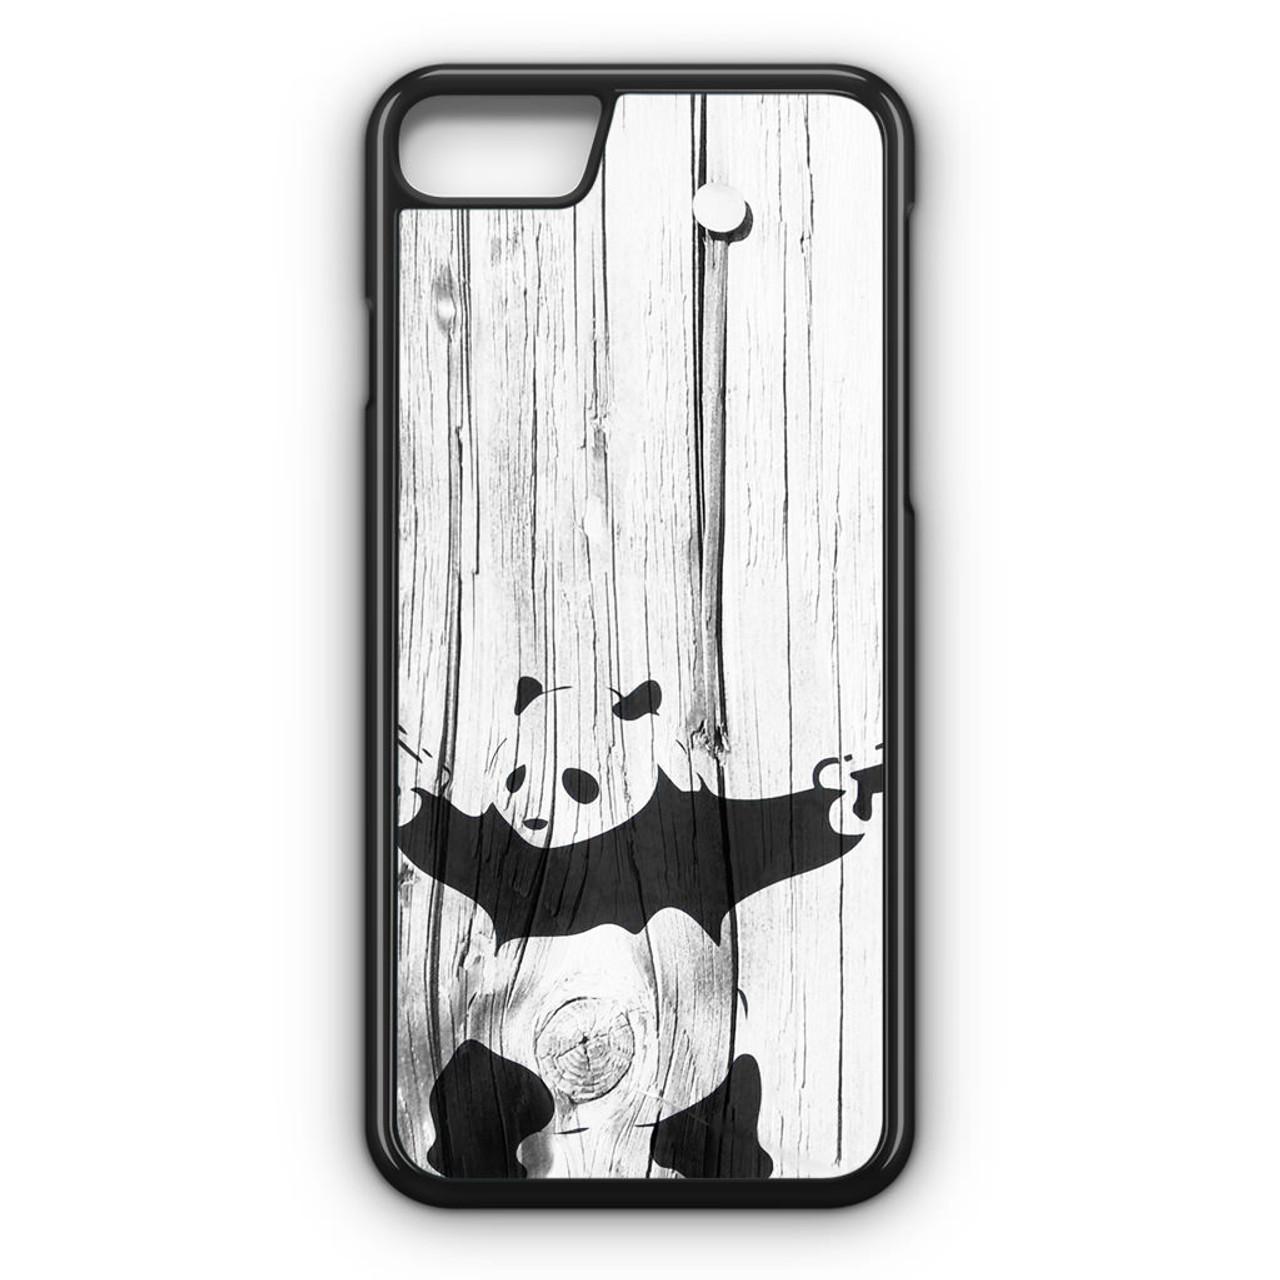 iphone 7 case banksy